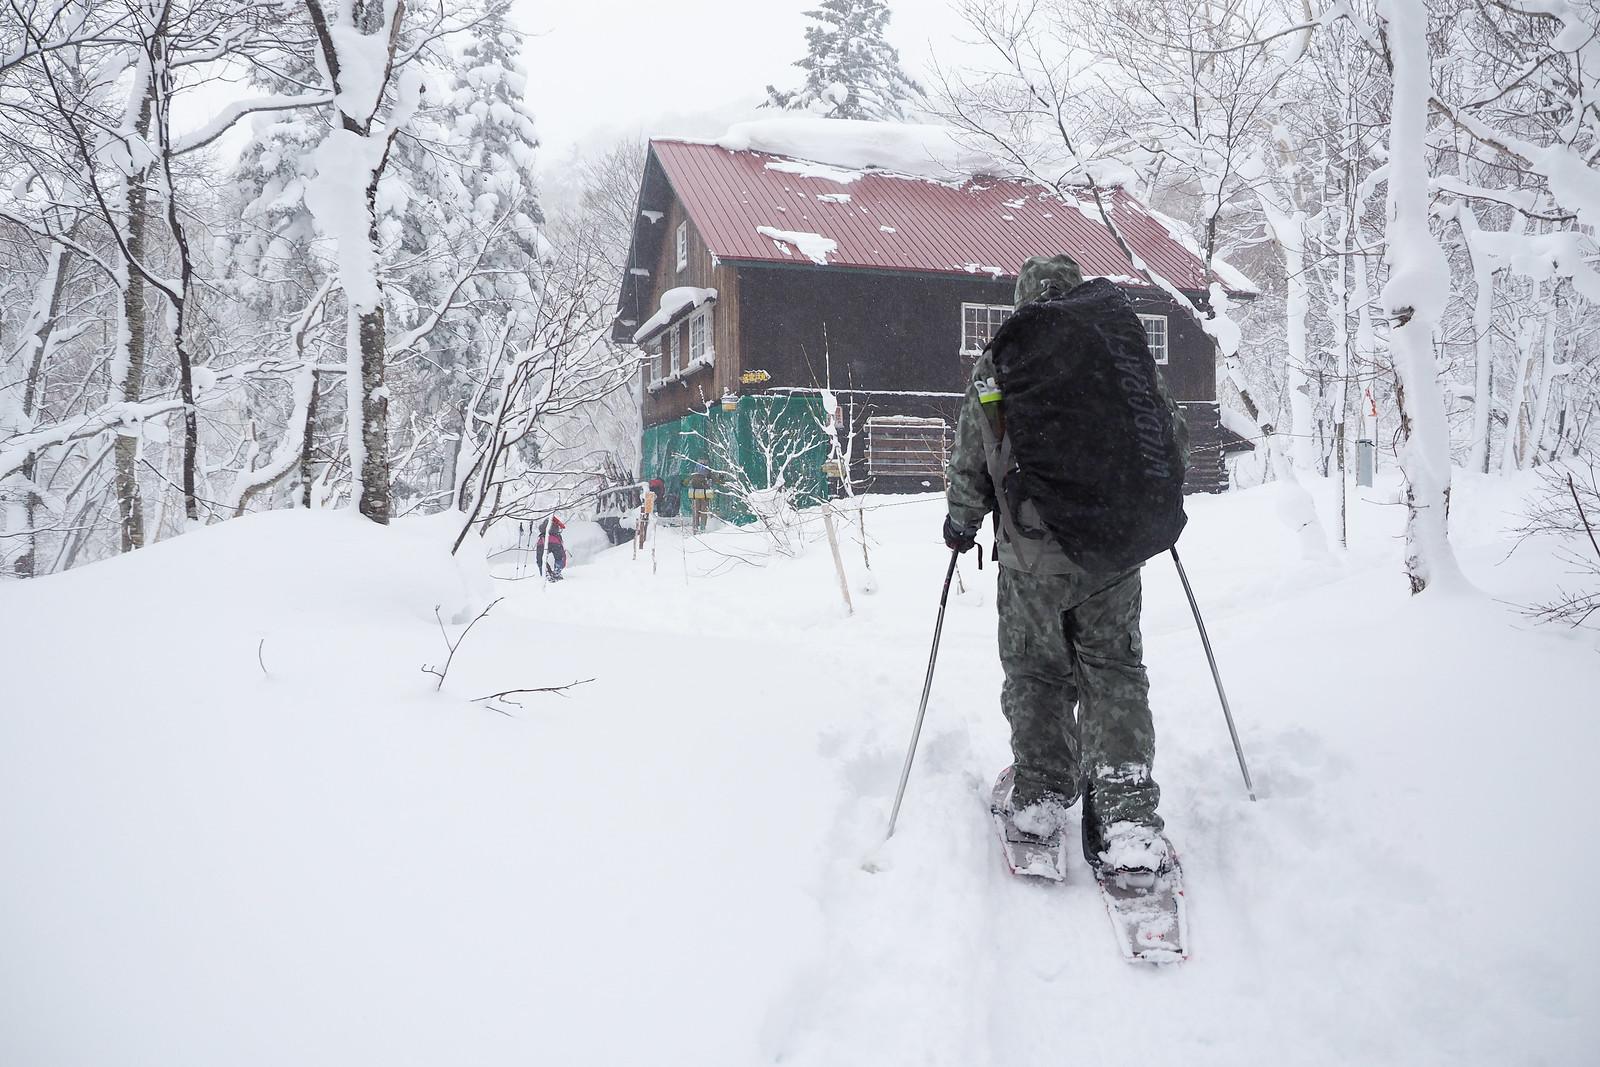 Mt. Haruka Ginreiso Hut Overnight Winter Trip Dec 2017 (Hokkaido, Japan)